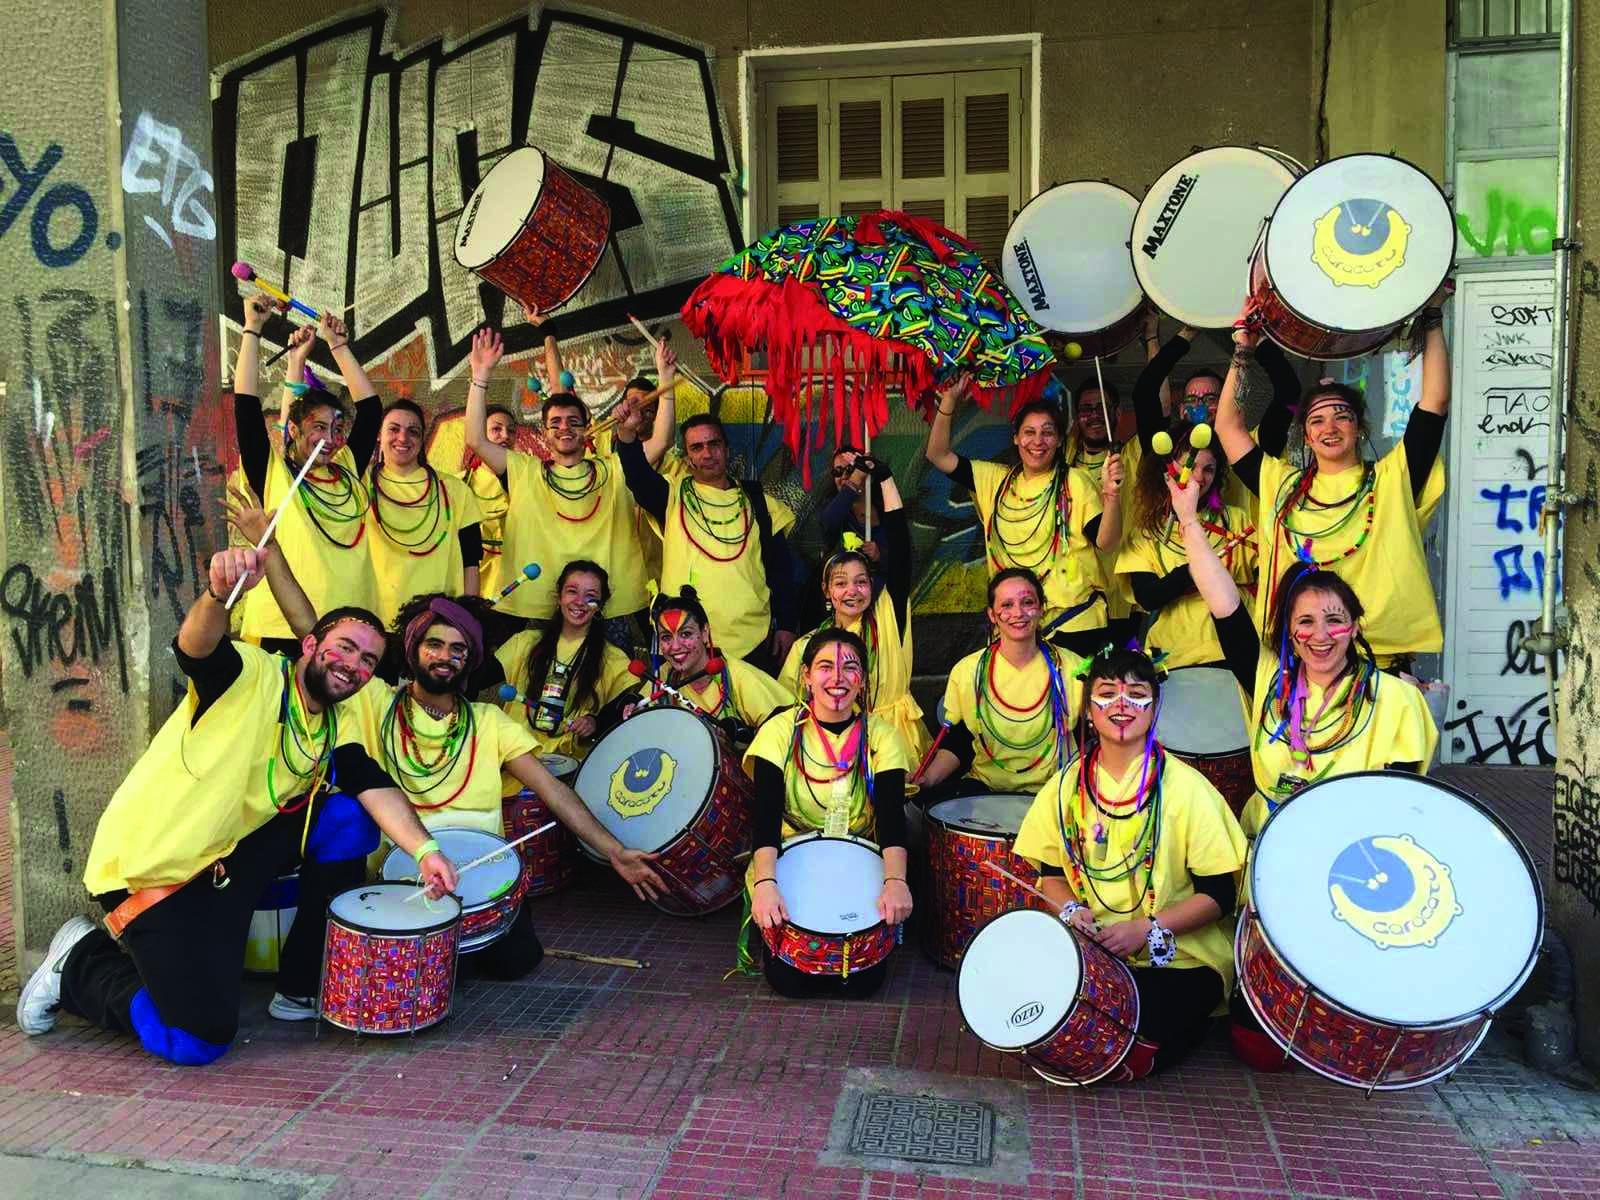 Photo of Οι Caracatu θα πλαισιώσουν την Καρναβαλική Παρέλαση στα Φάρσαλα